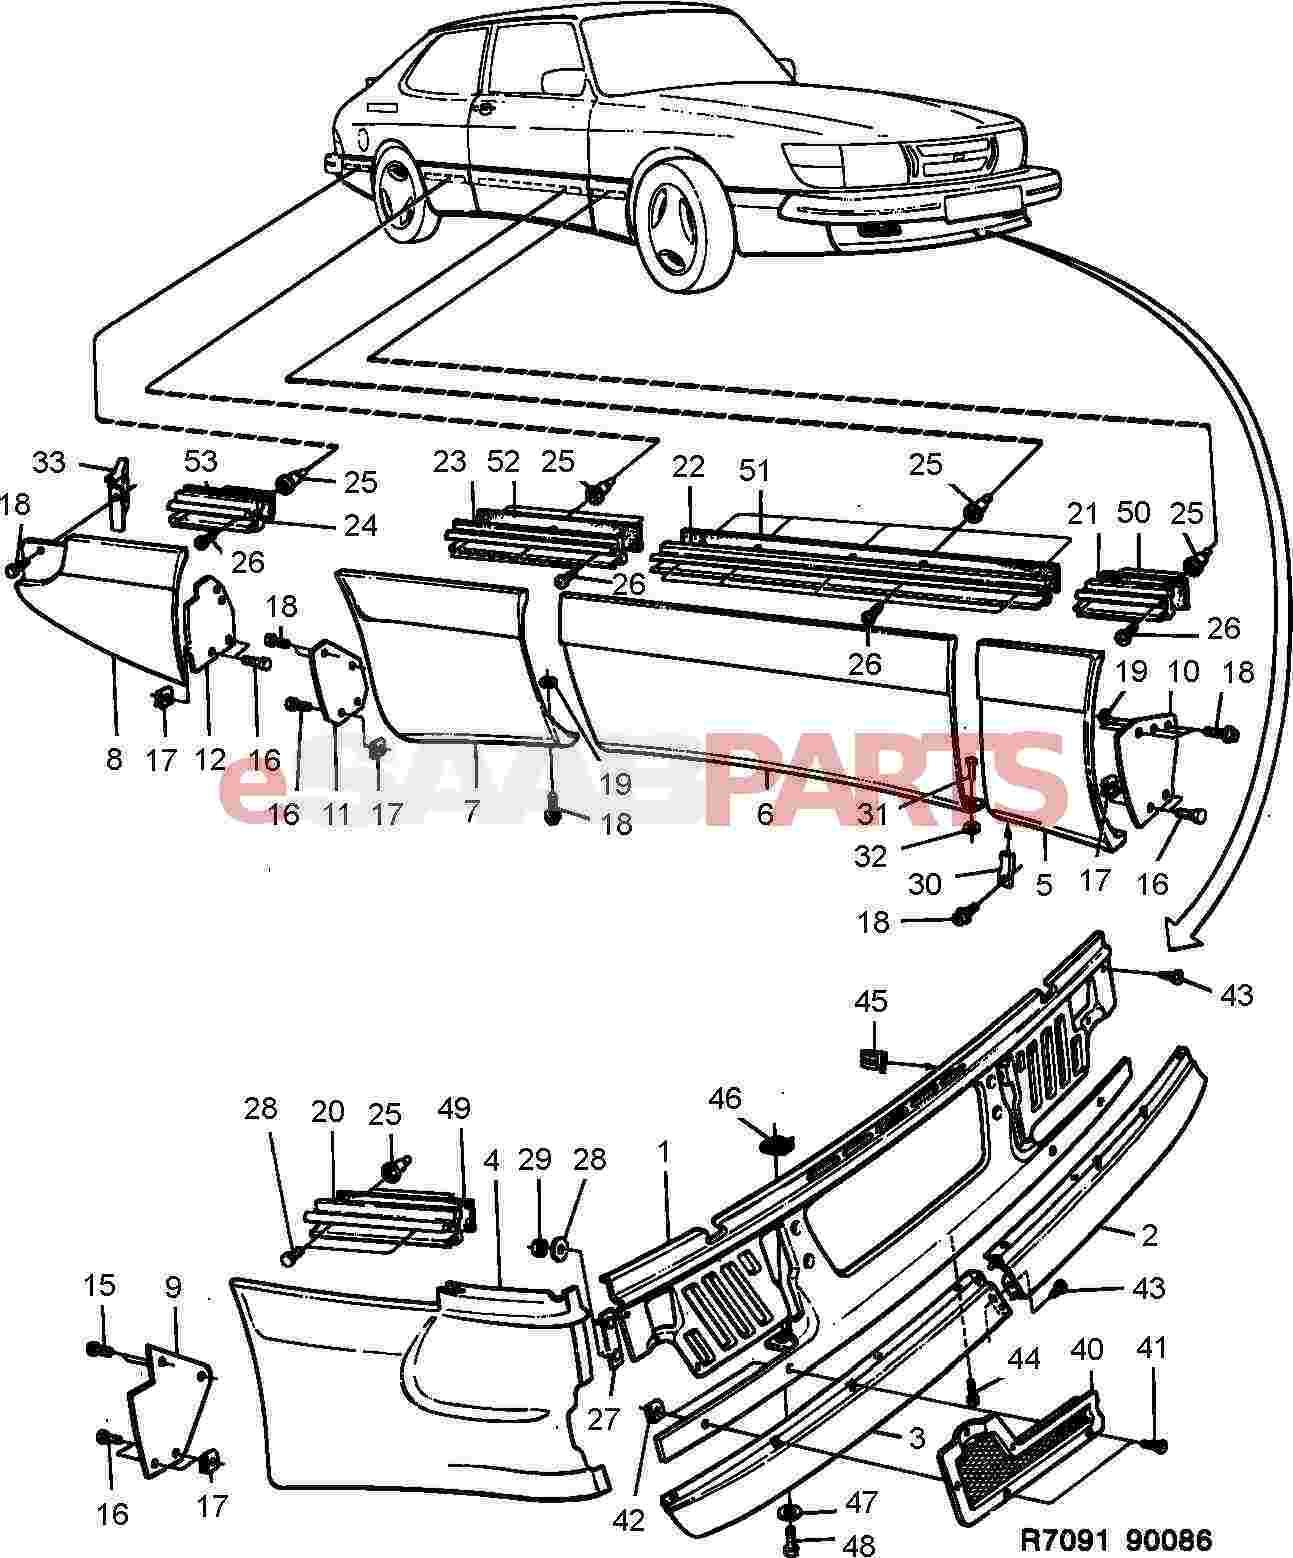 hight resolution of esaabparts com saab 900 car body external parts body mouldings external aero kit spg